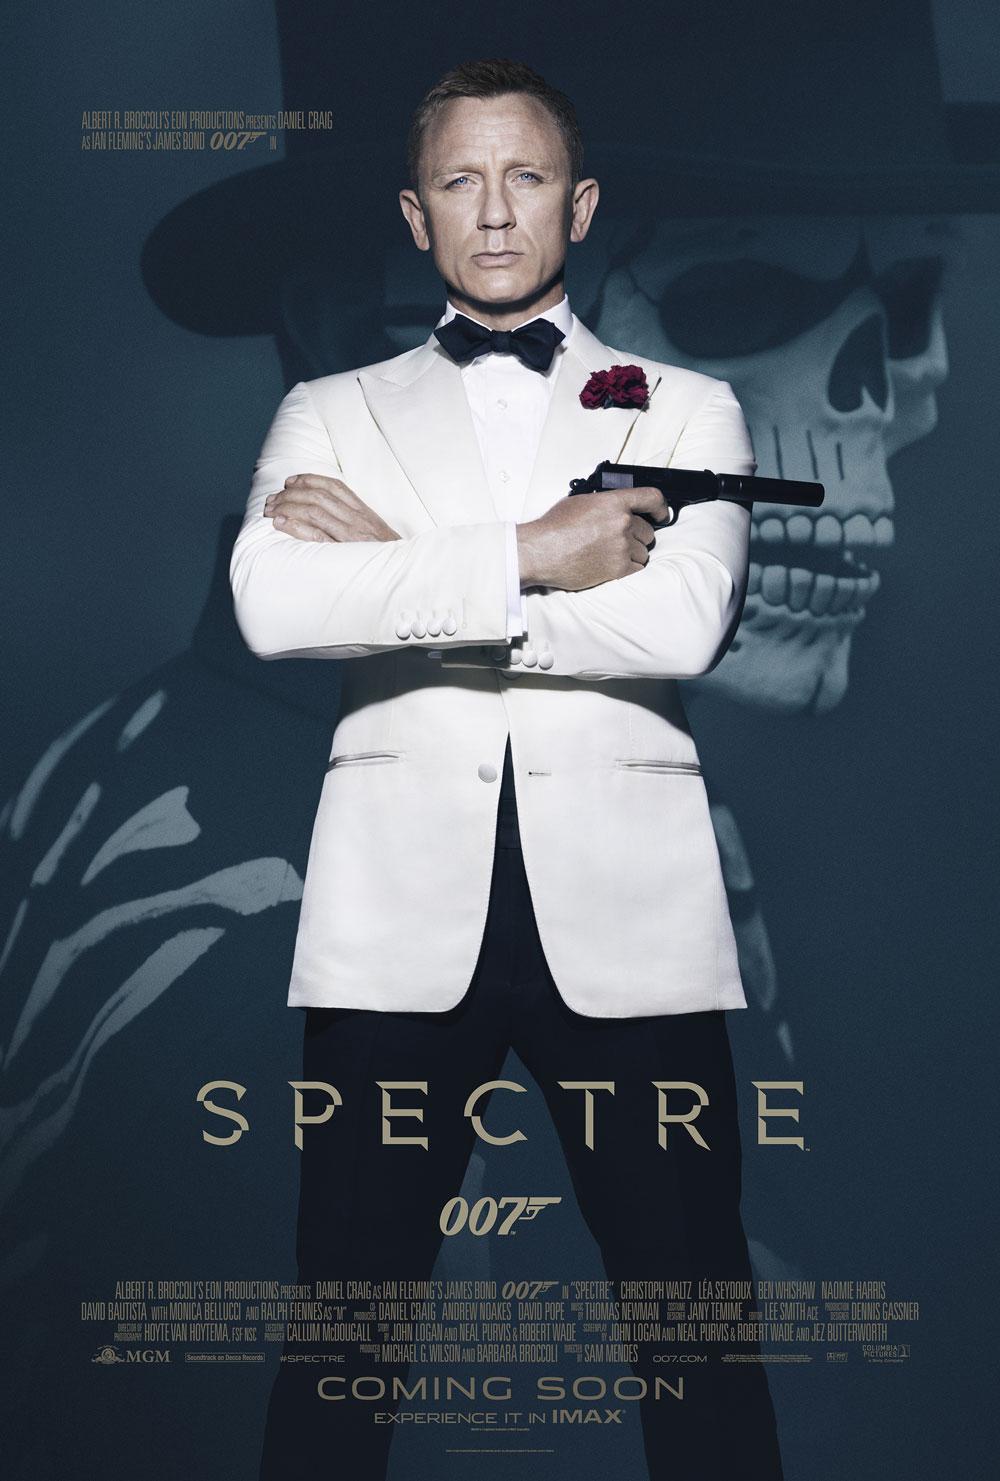 007. Spectre. Poster